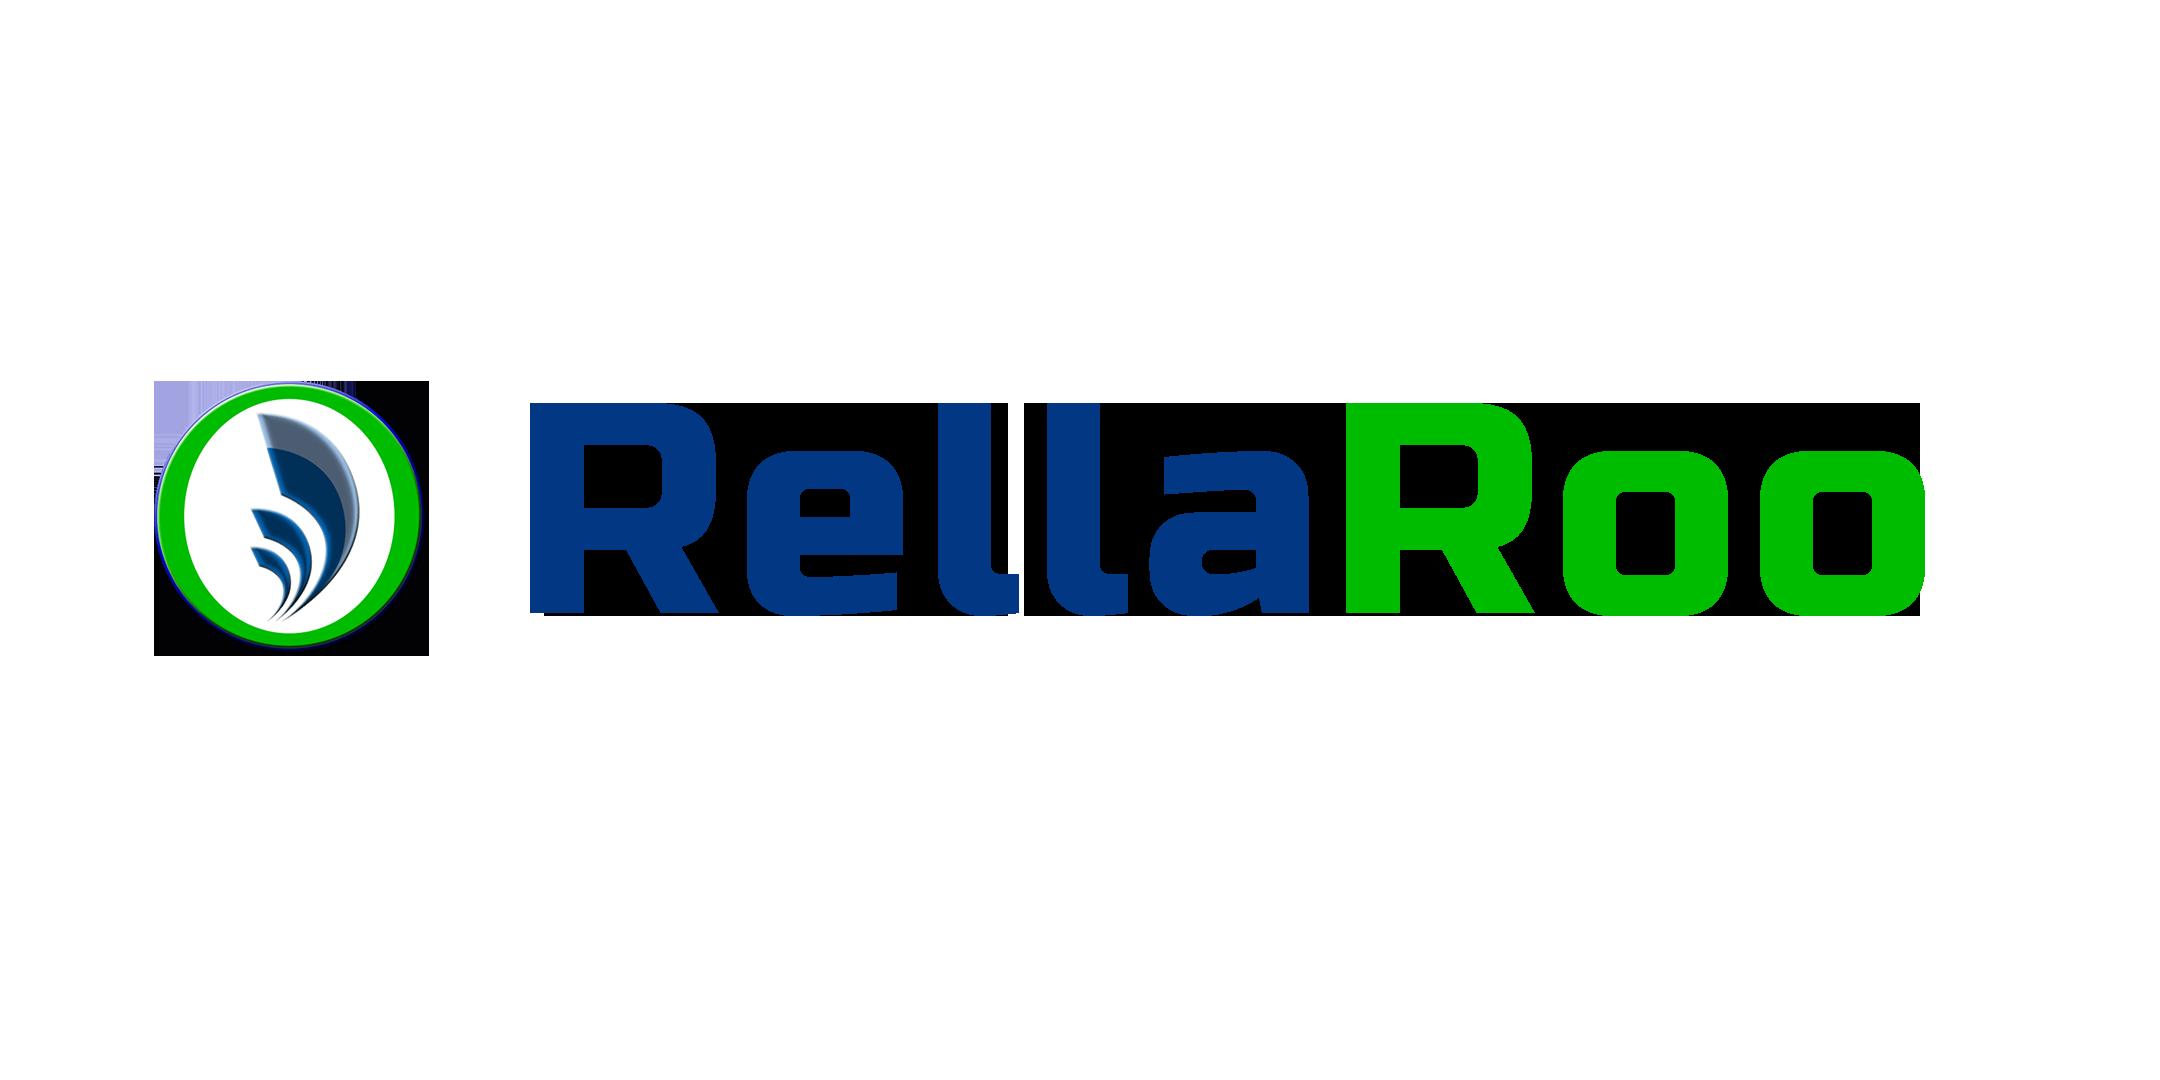 RellaRoo